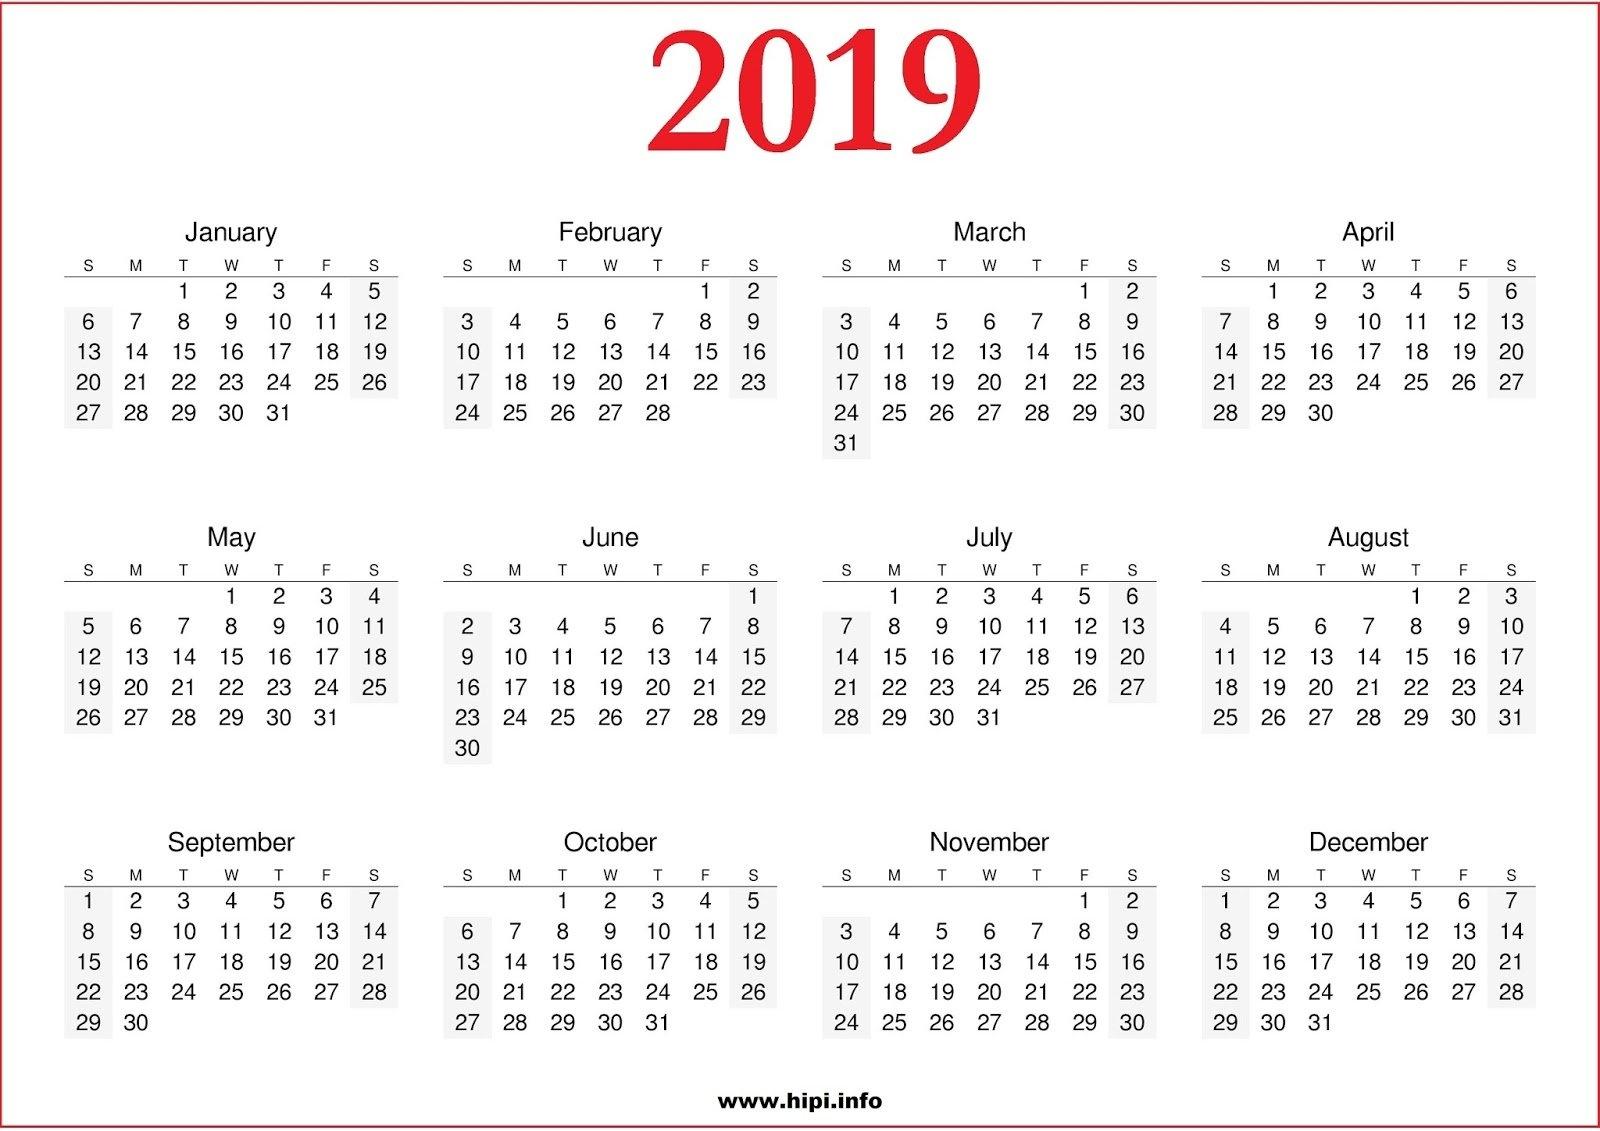 2019 Kalenteri | Download 2019 Calendar Printable With Holidays List July 6 2019 Calendar